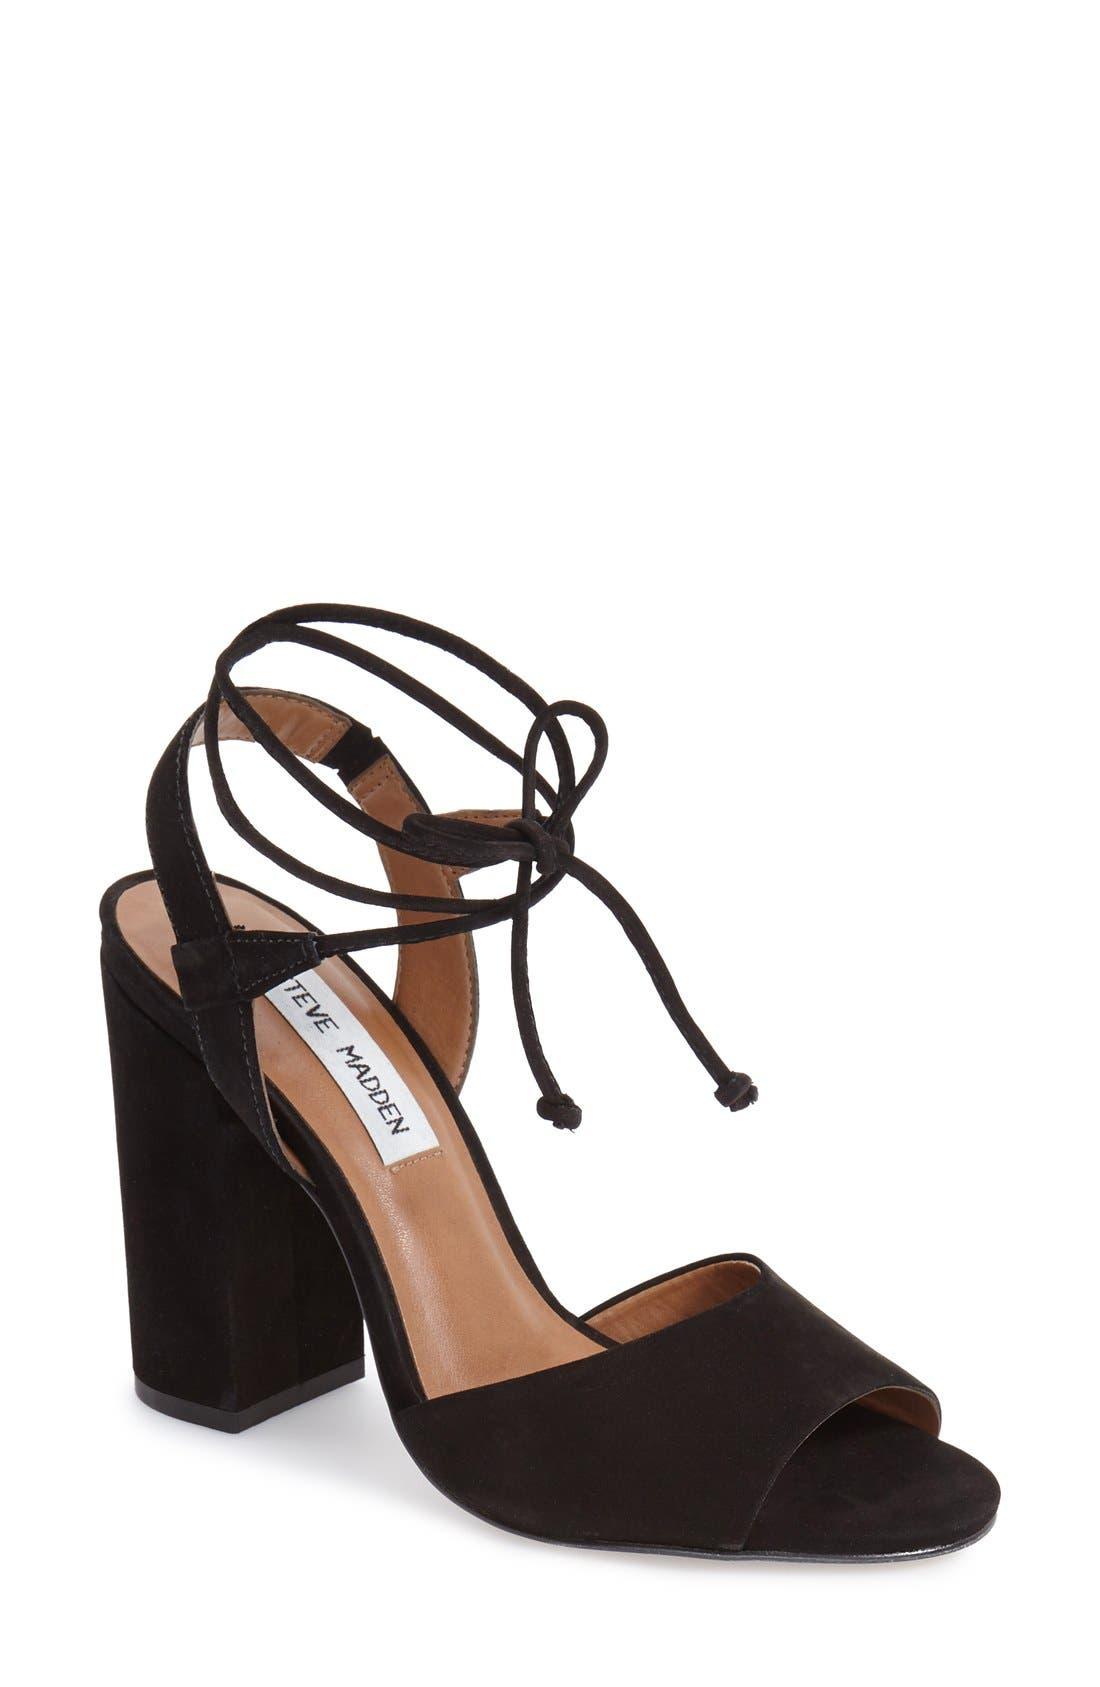 Alternate Image 1 Selected - Steve Madden 'Serrina' Block Heel Lace Up Sandal (Women)